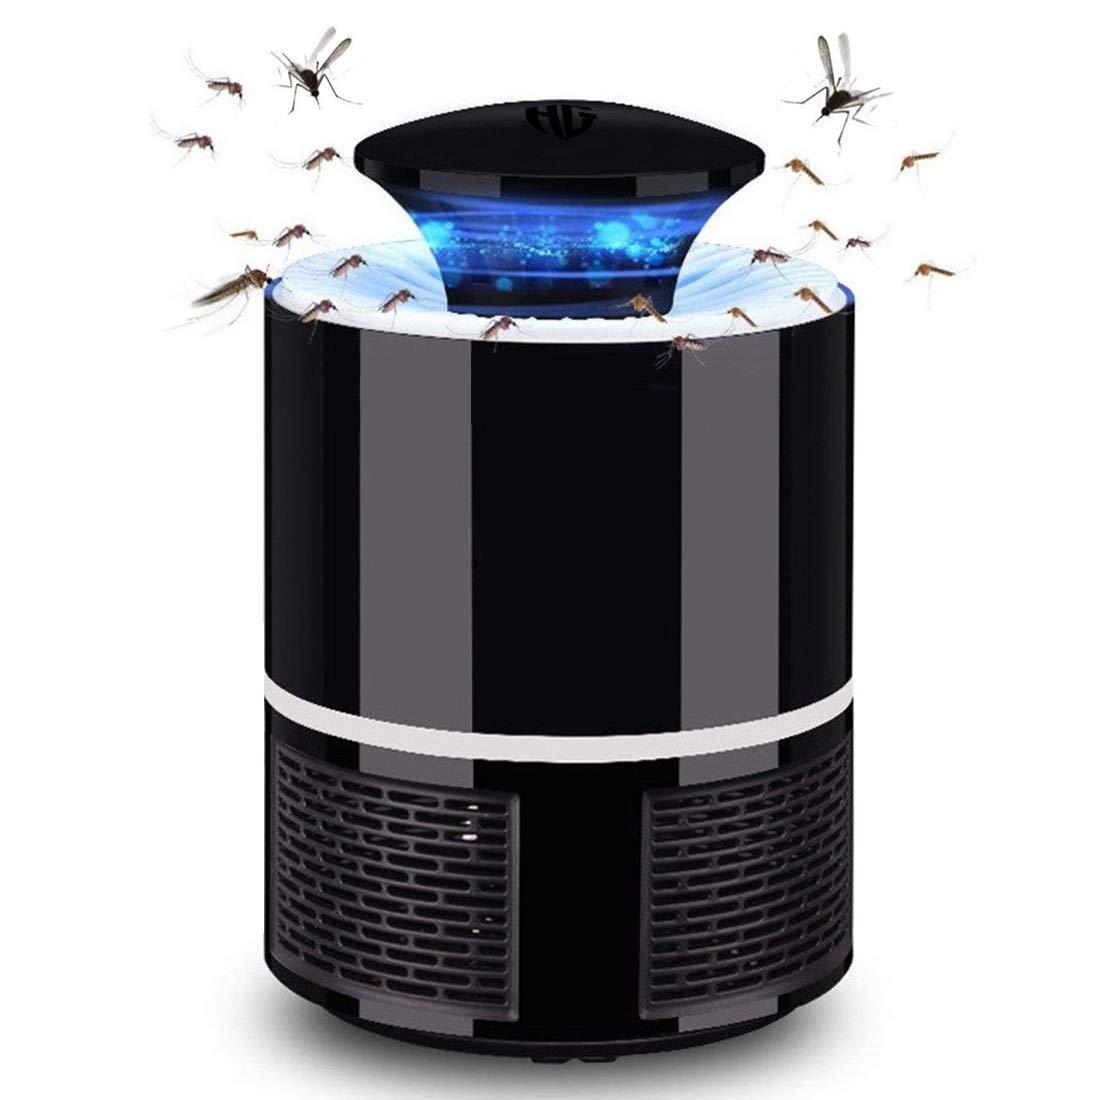 TWO BIX Electronic Led Mosquito Killer